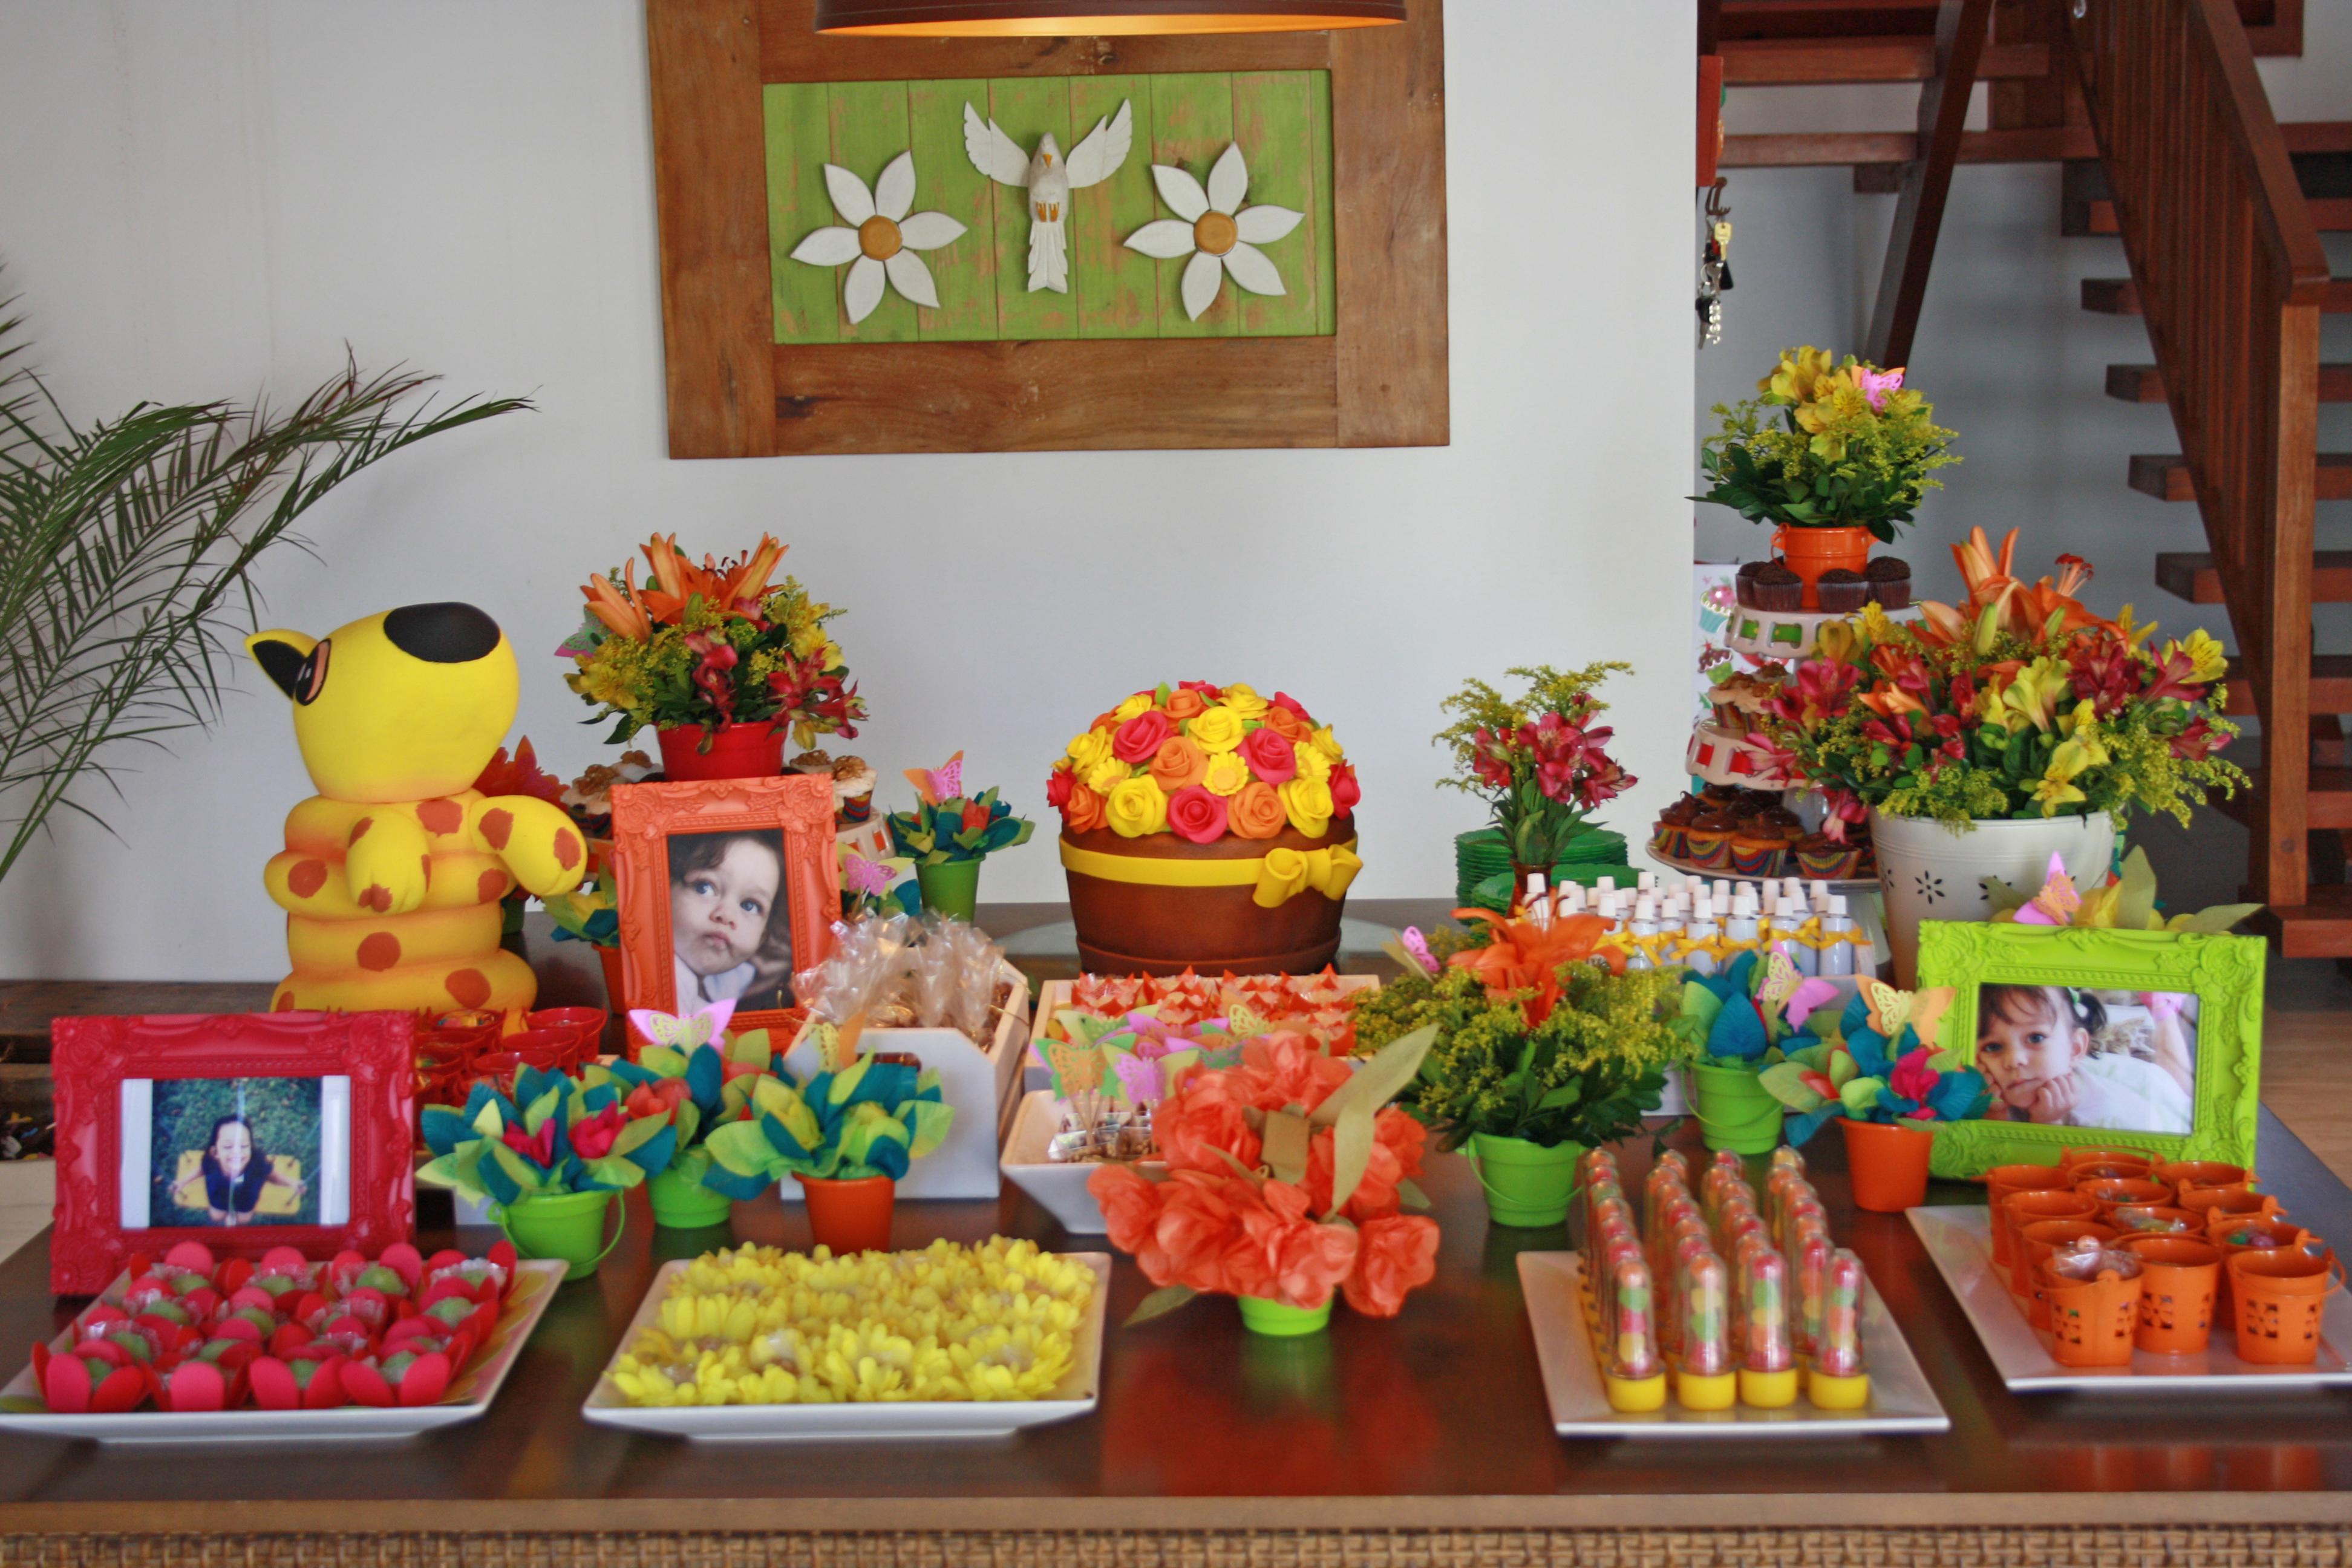 festa jardim da clarilu : festa jardim da clarilu:Festa de Aniversário: Jardim da Clarilú! – Corujices